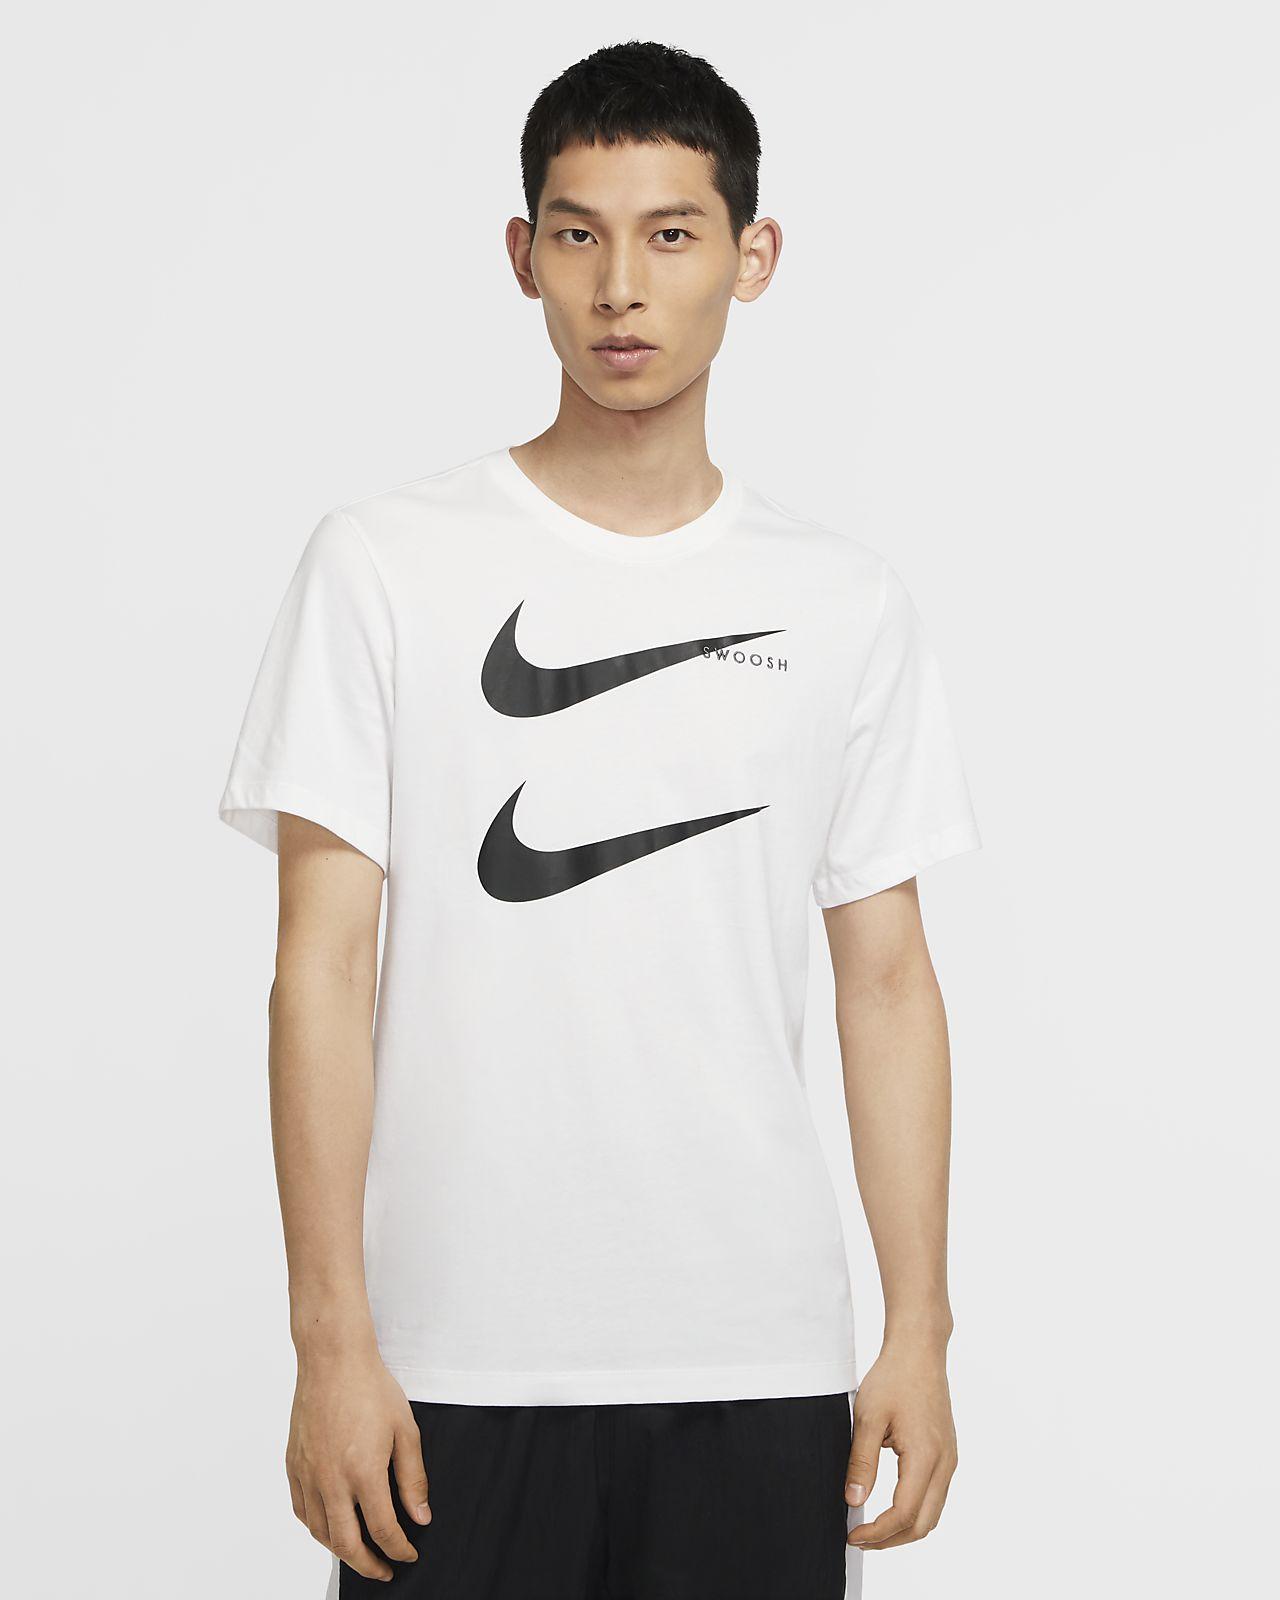 Nike Sportswear Swoosh 男款 T 恤